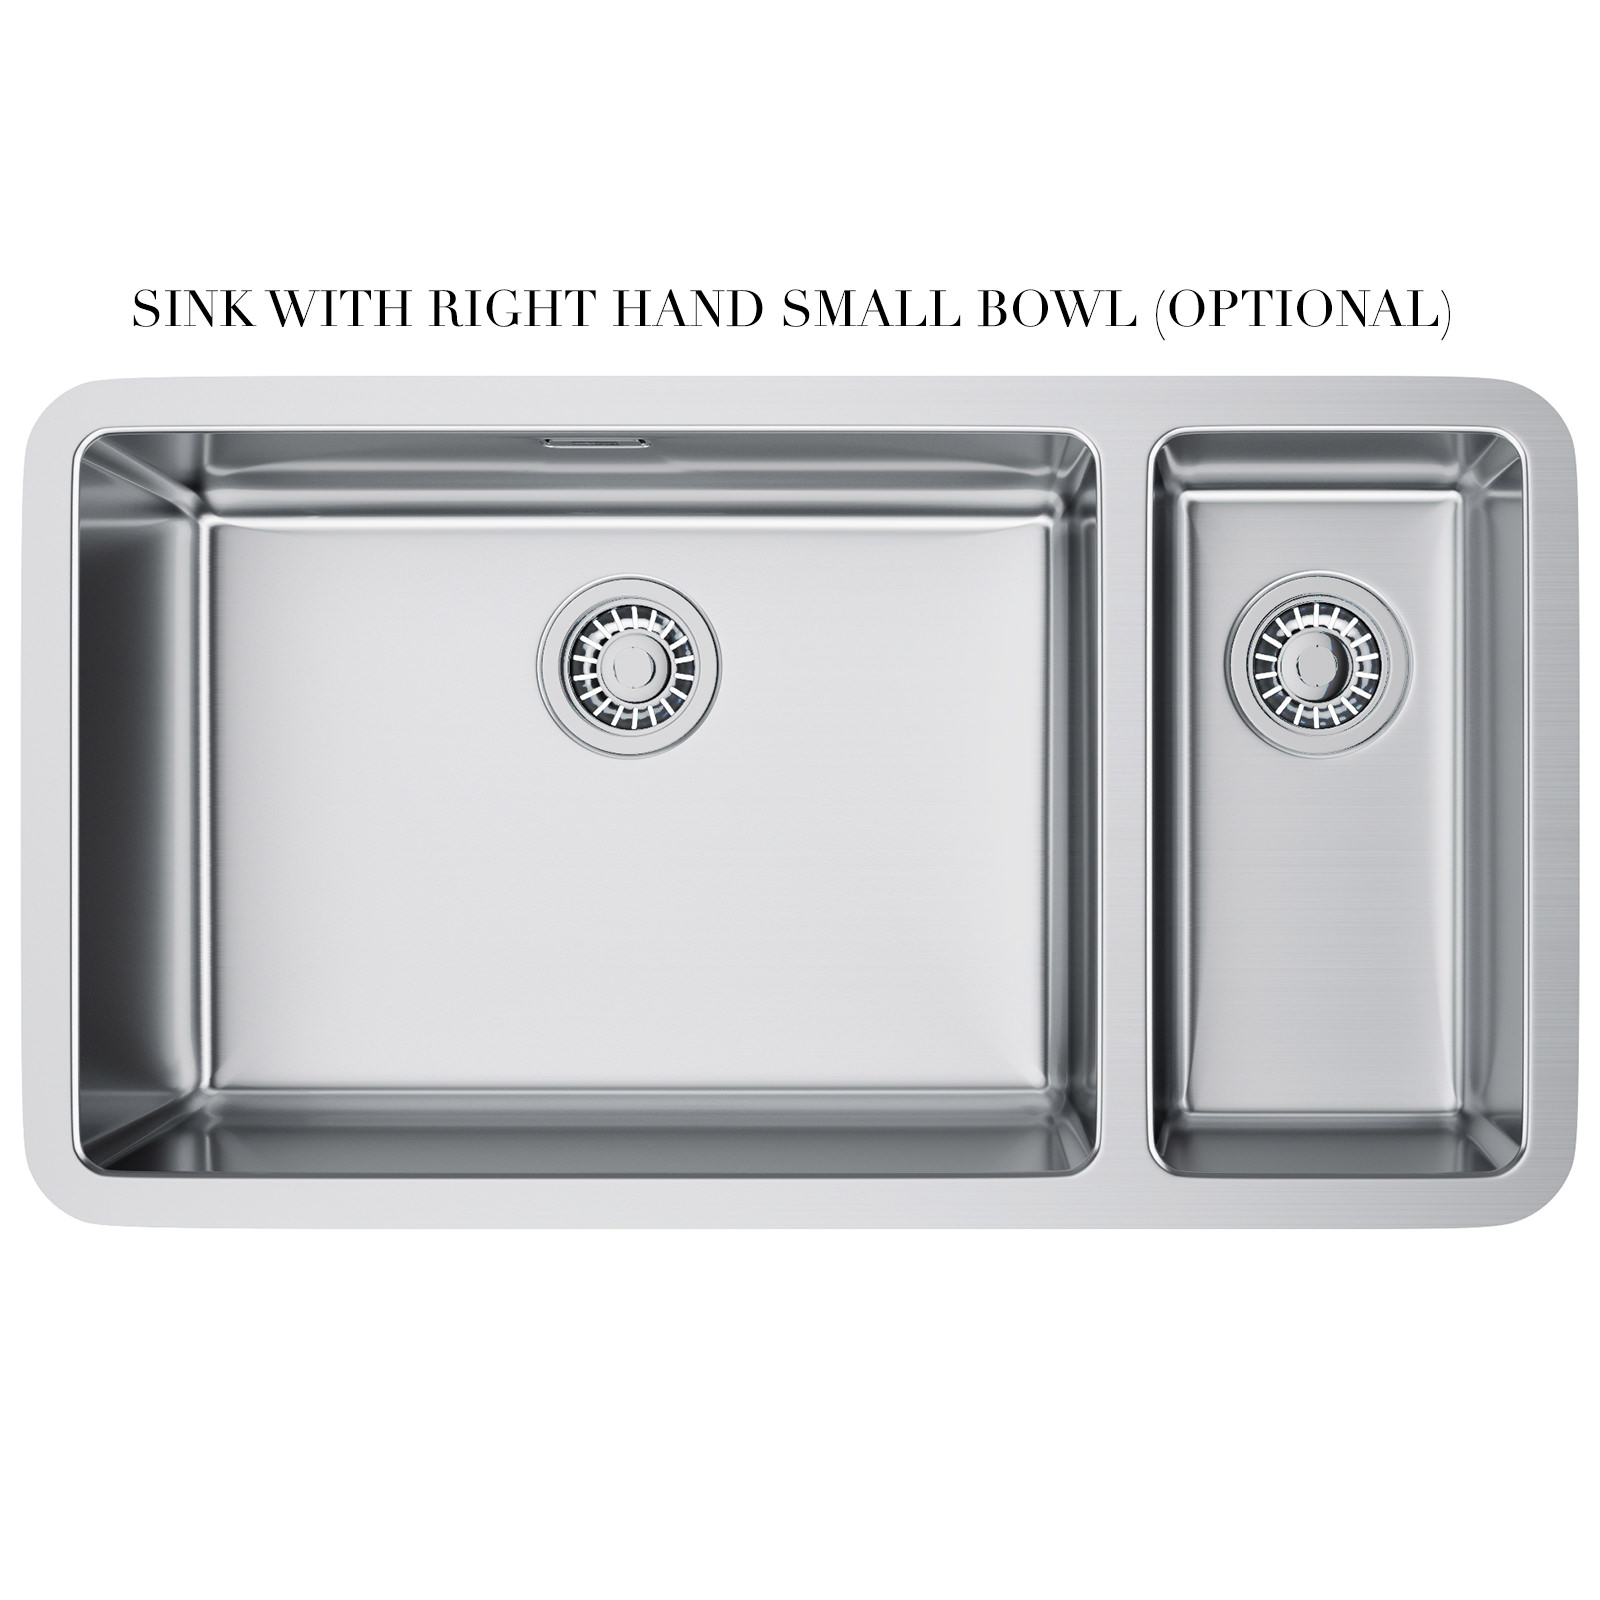 ... of Franke Kubus KBX 160 55-20 Stainless Steel 1.5 Bowl Undermount Sink